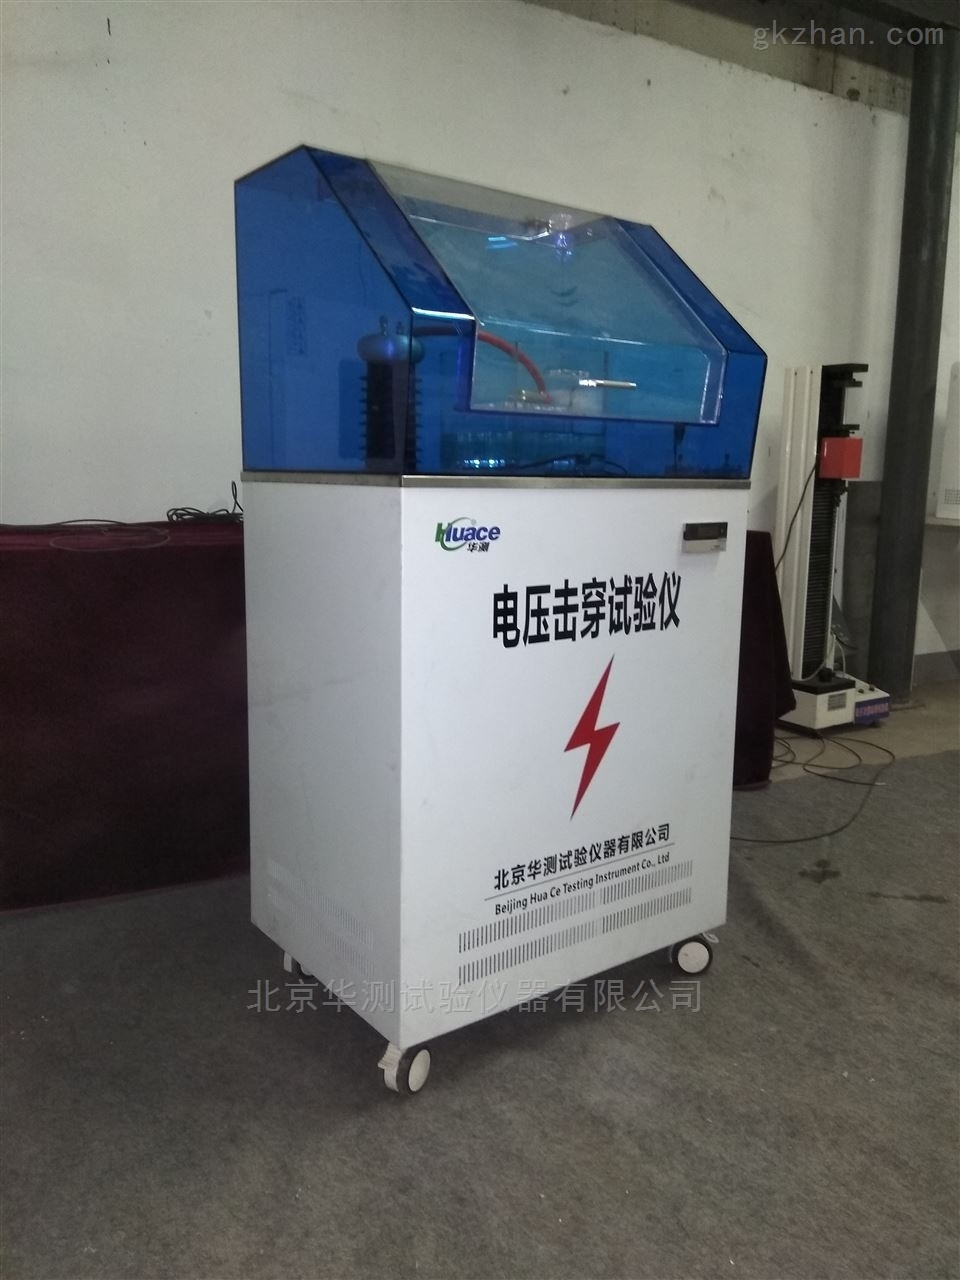 HCDJC-50KV电压击穿试验仪